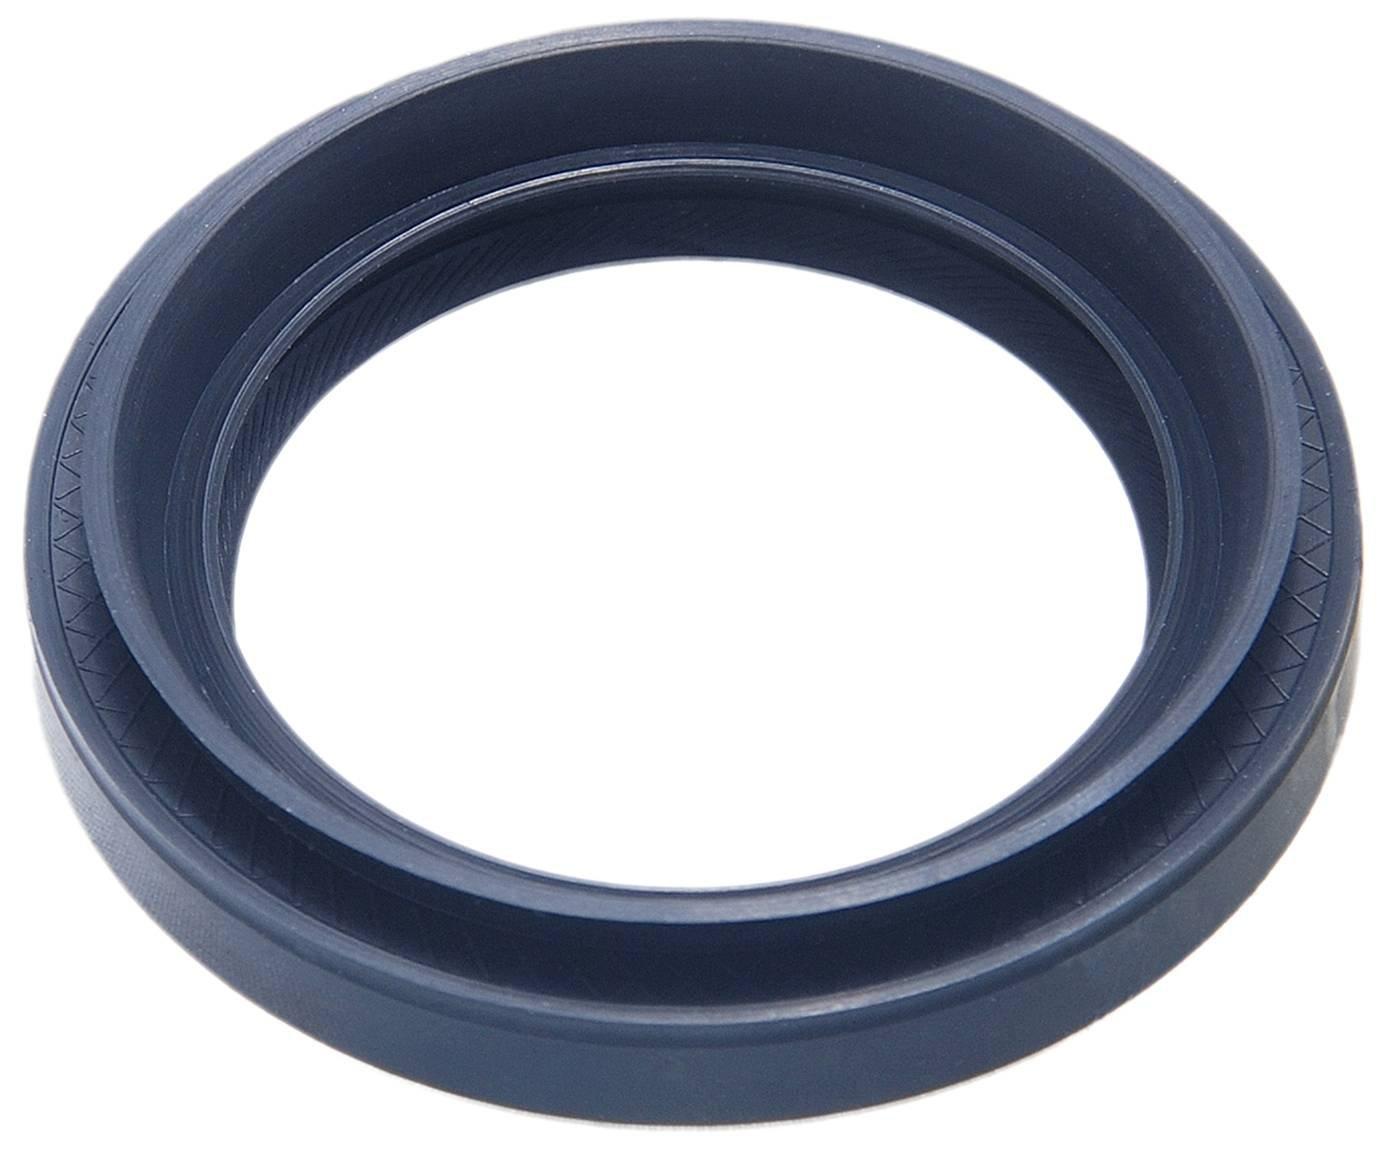 91205-Pl3-B01 / 91205Pl3B01 - Oil Seal (Axle Case) (41X56X8X11, 4) For Honda Febest